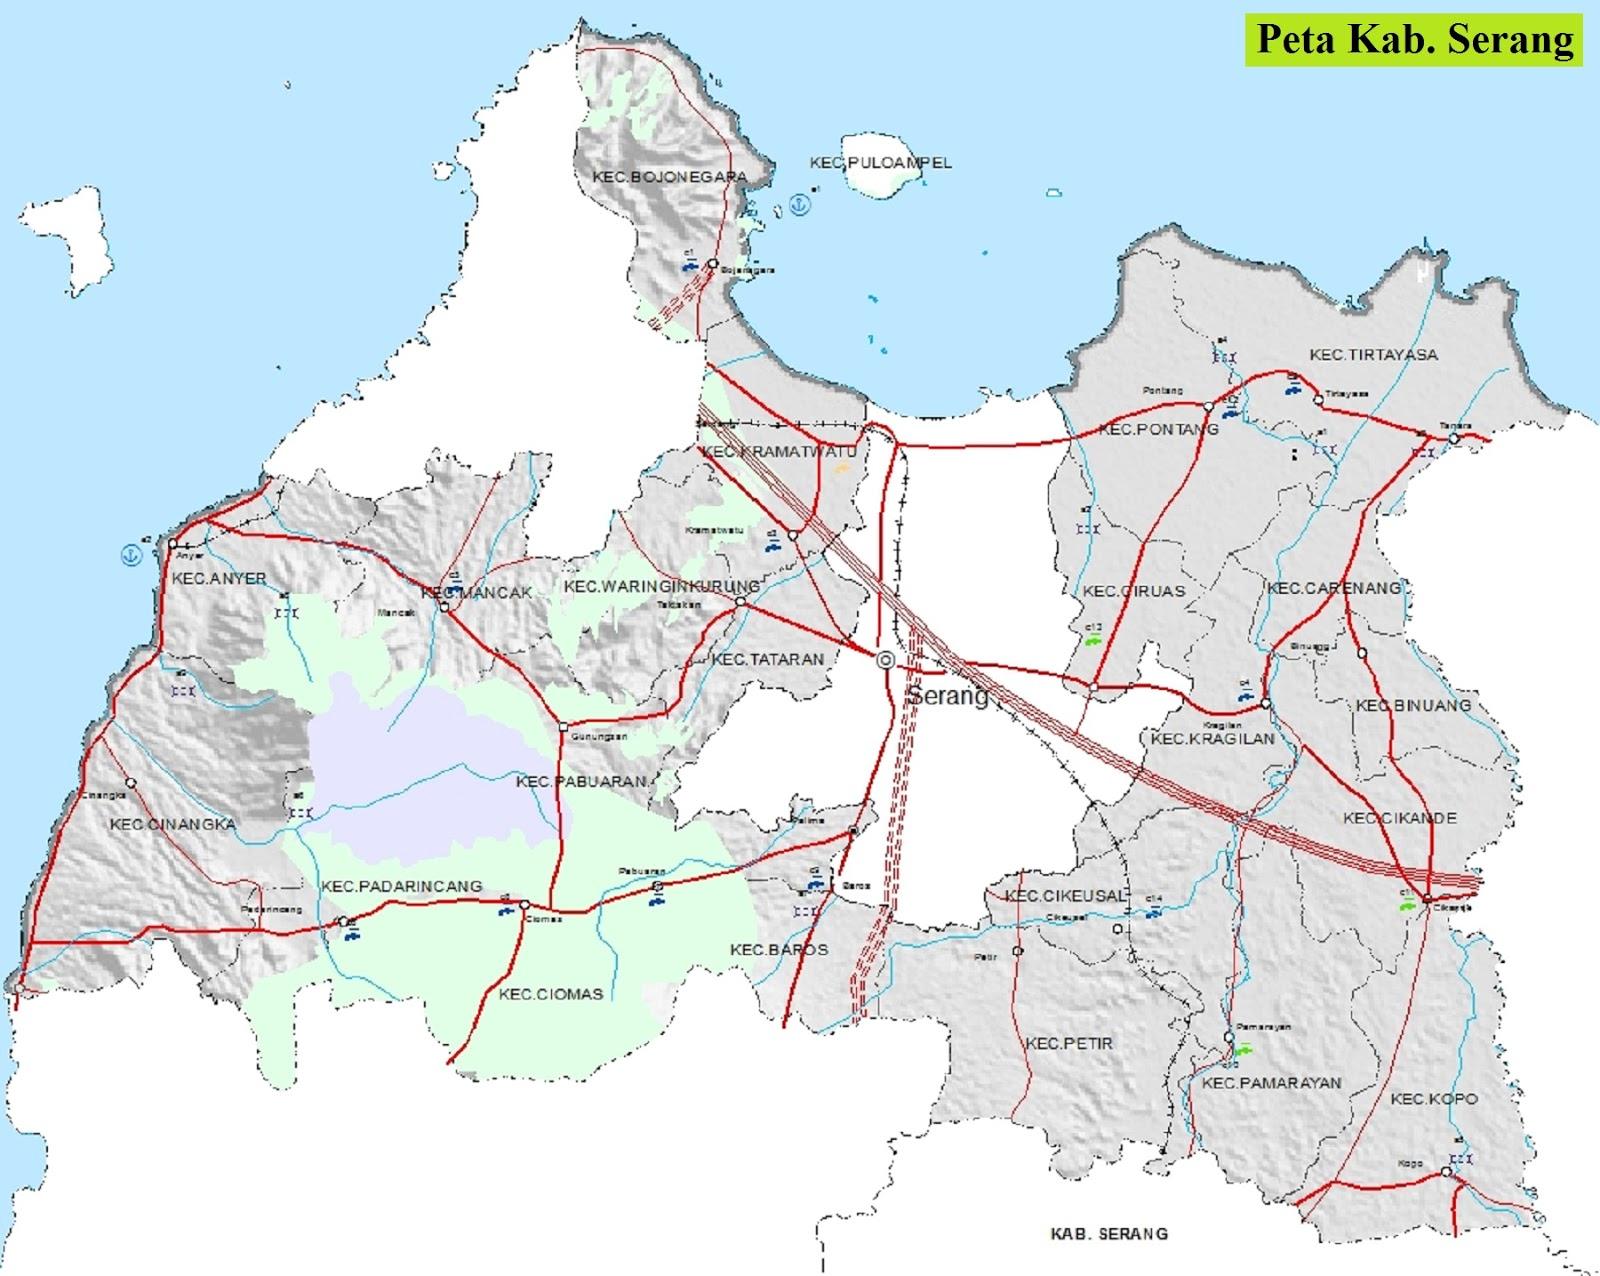 Peta Kabupaten Serang HD